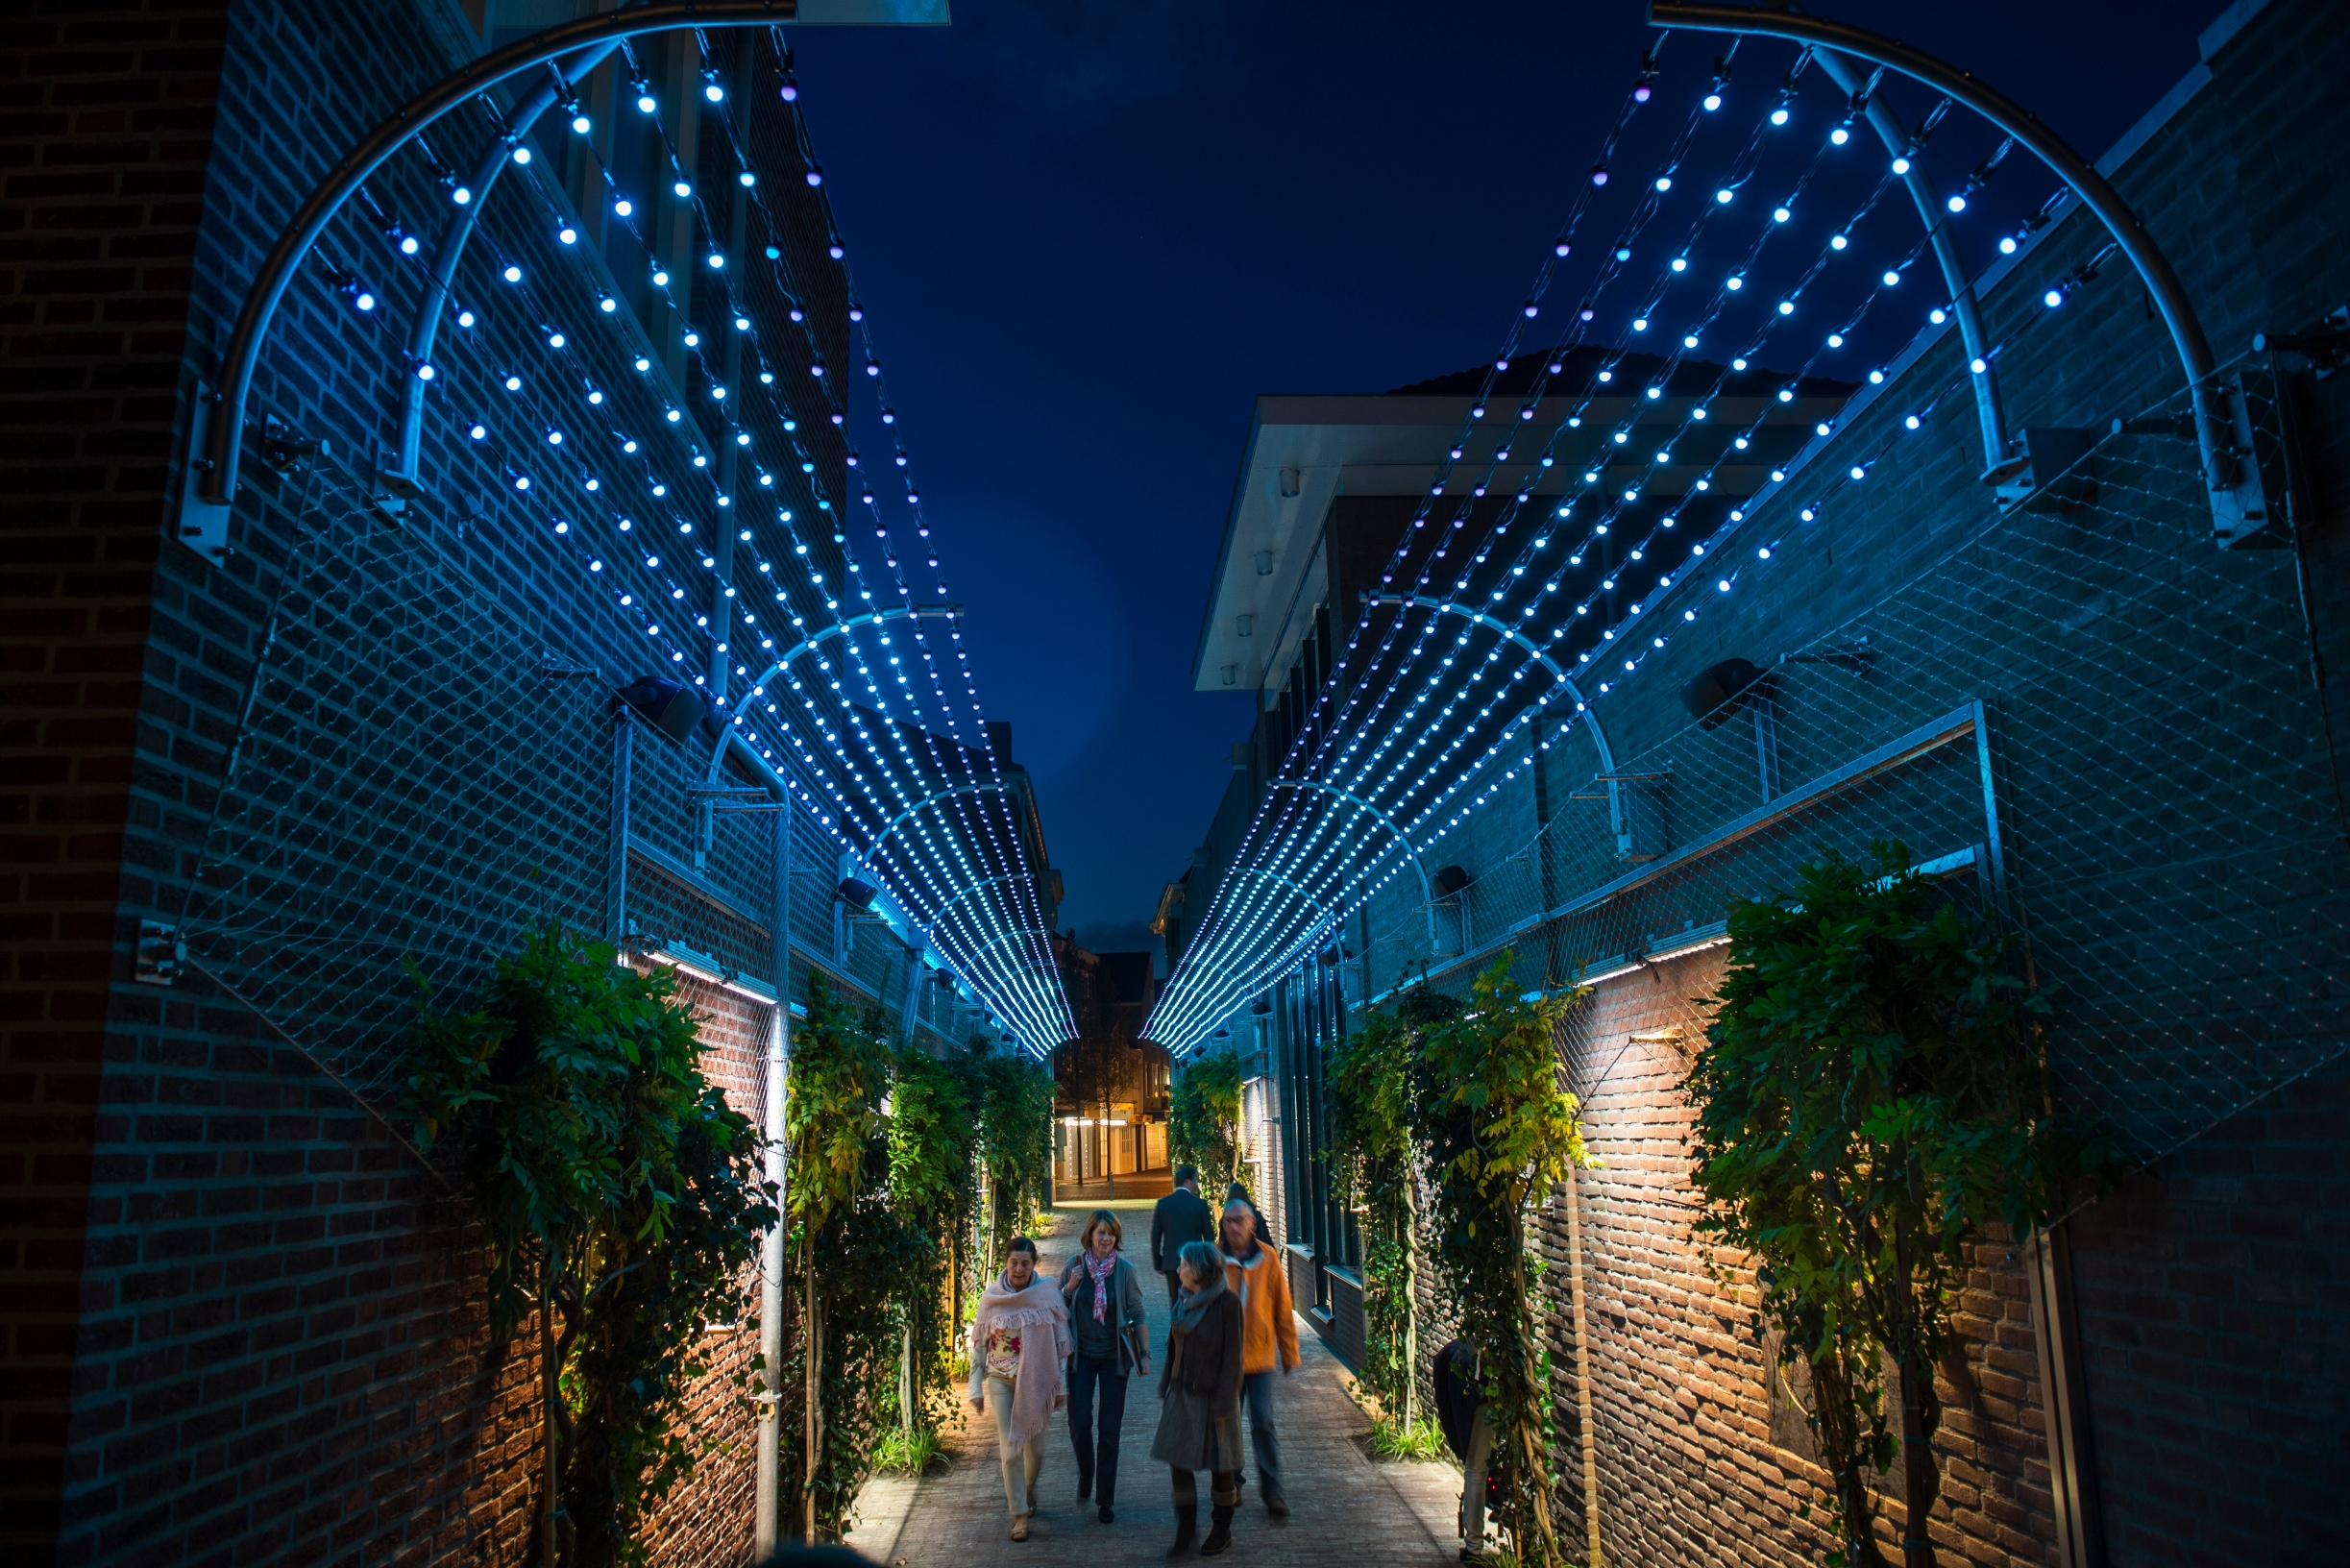 Smart Urban Lighting in Veghel, NL